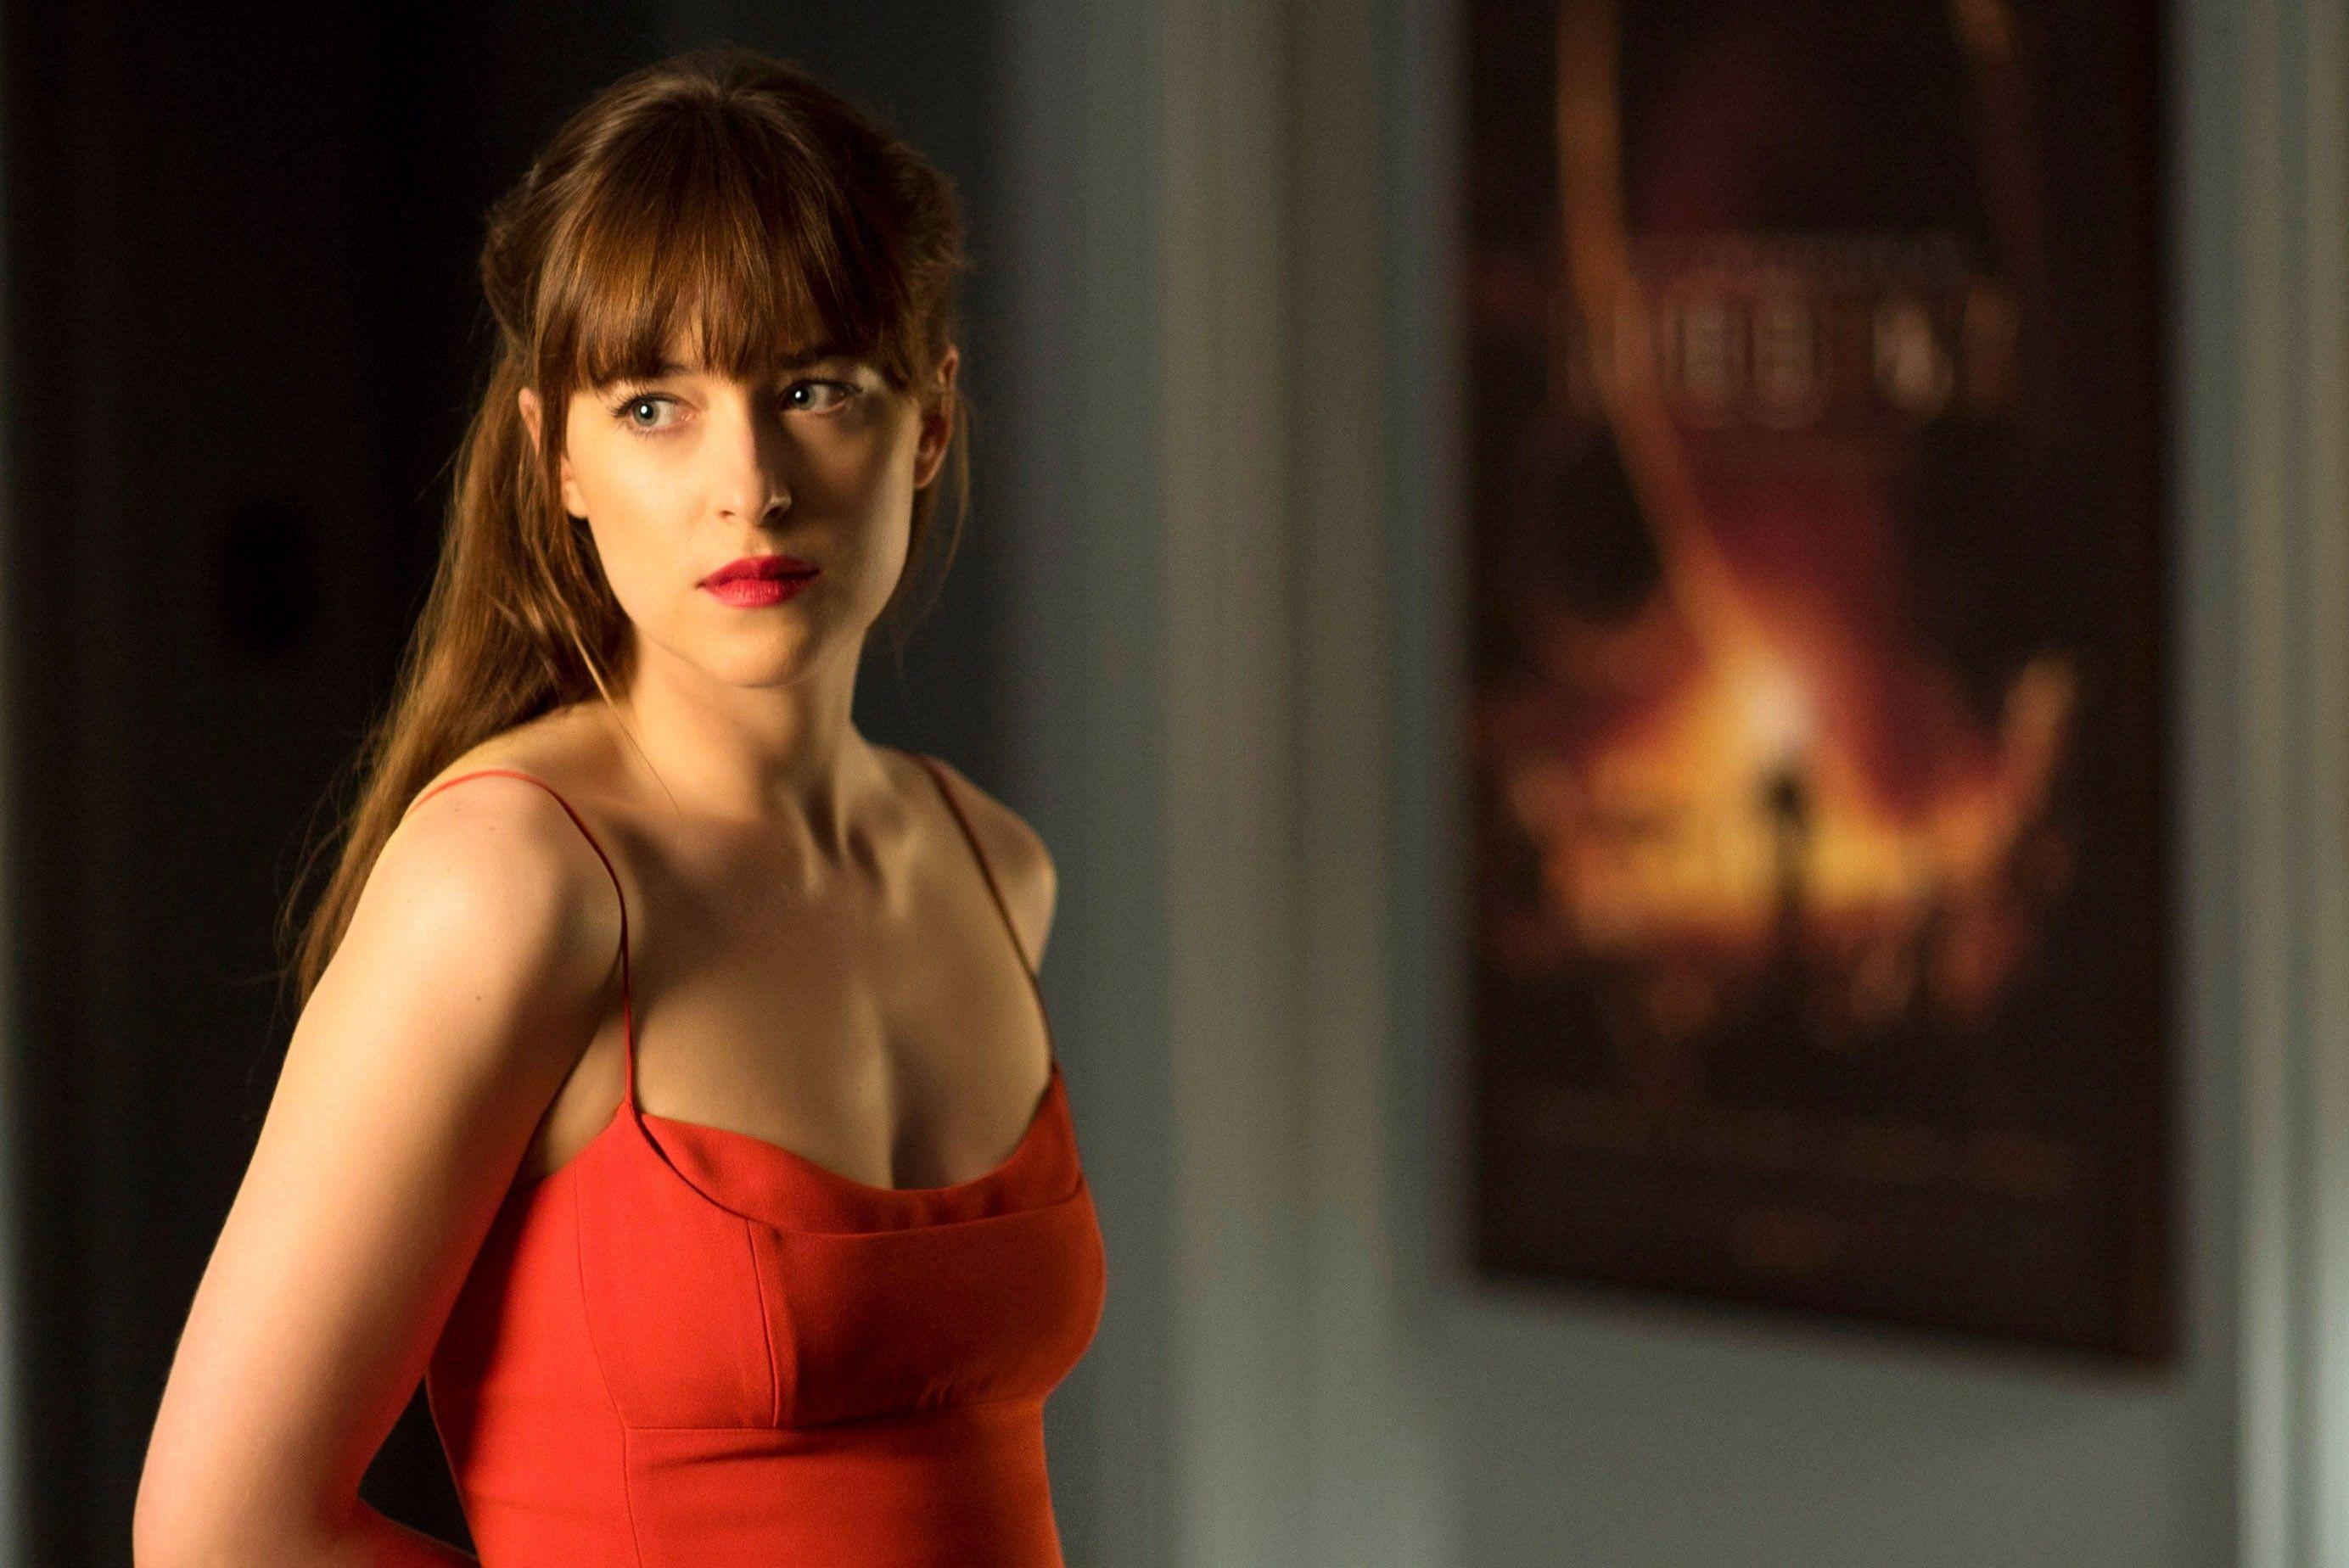 Dakota Johnson In Fifty Shades Is Making Bangs Hot Not Cute